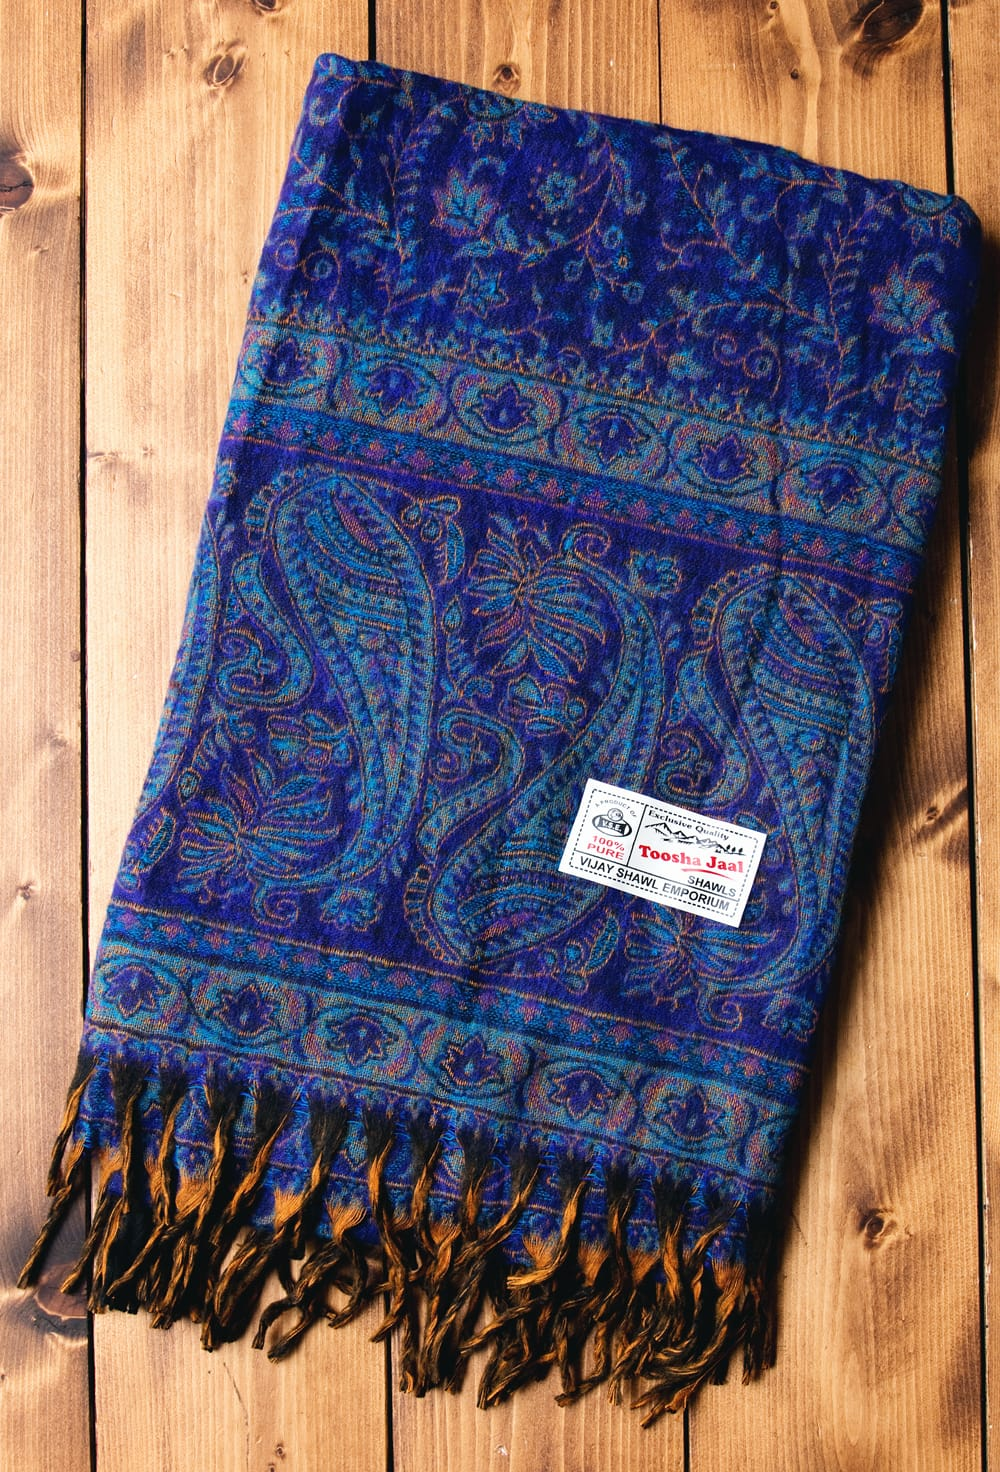 〔210cm×95cm〕インドの伝統柄大判ストール・ショール - 青紫系の写真